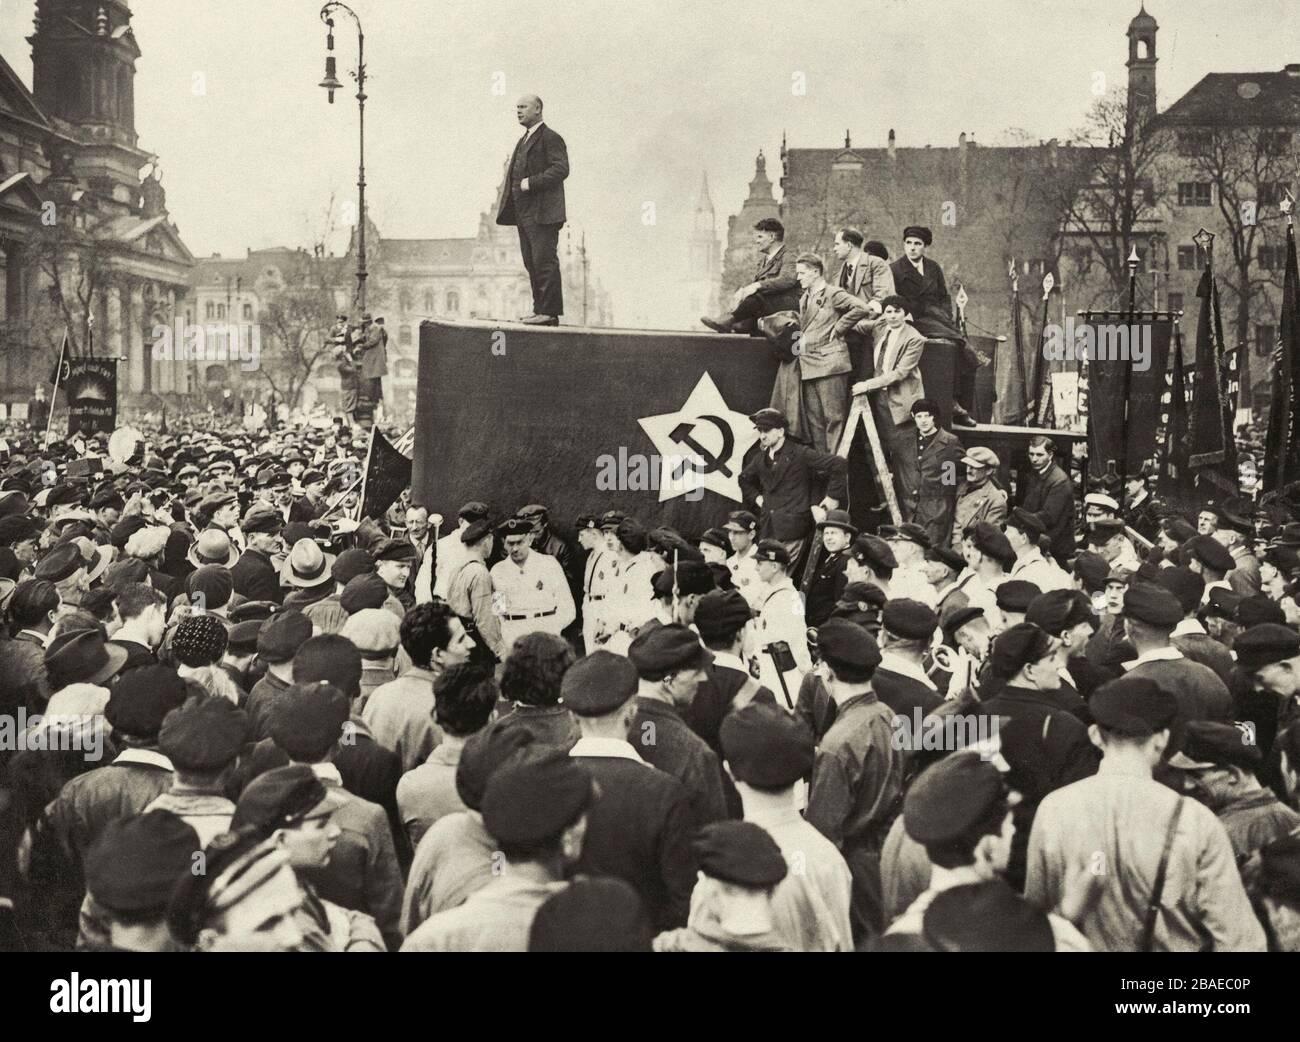 The German Communist Leader Ernst Thalmann Speaks During A Meeting In The Berlin Lustgarten 1 May 1931 Stock Photo